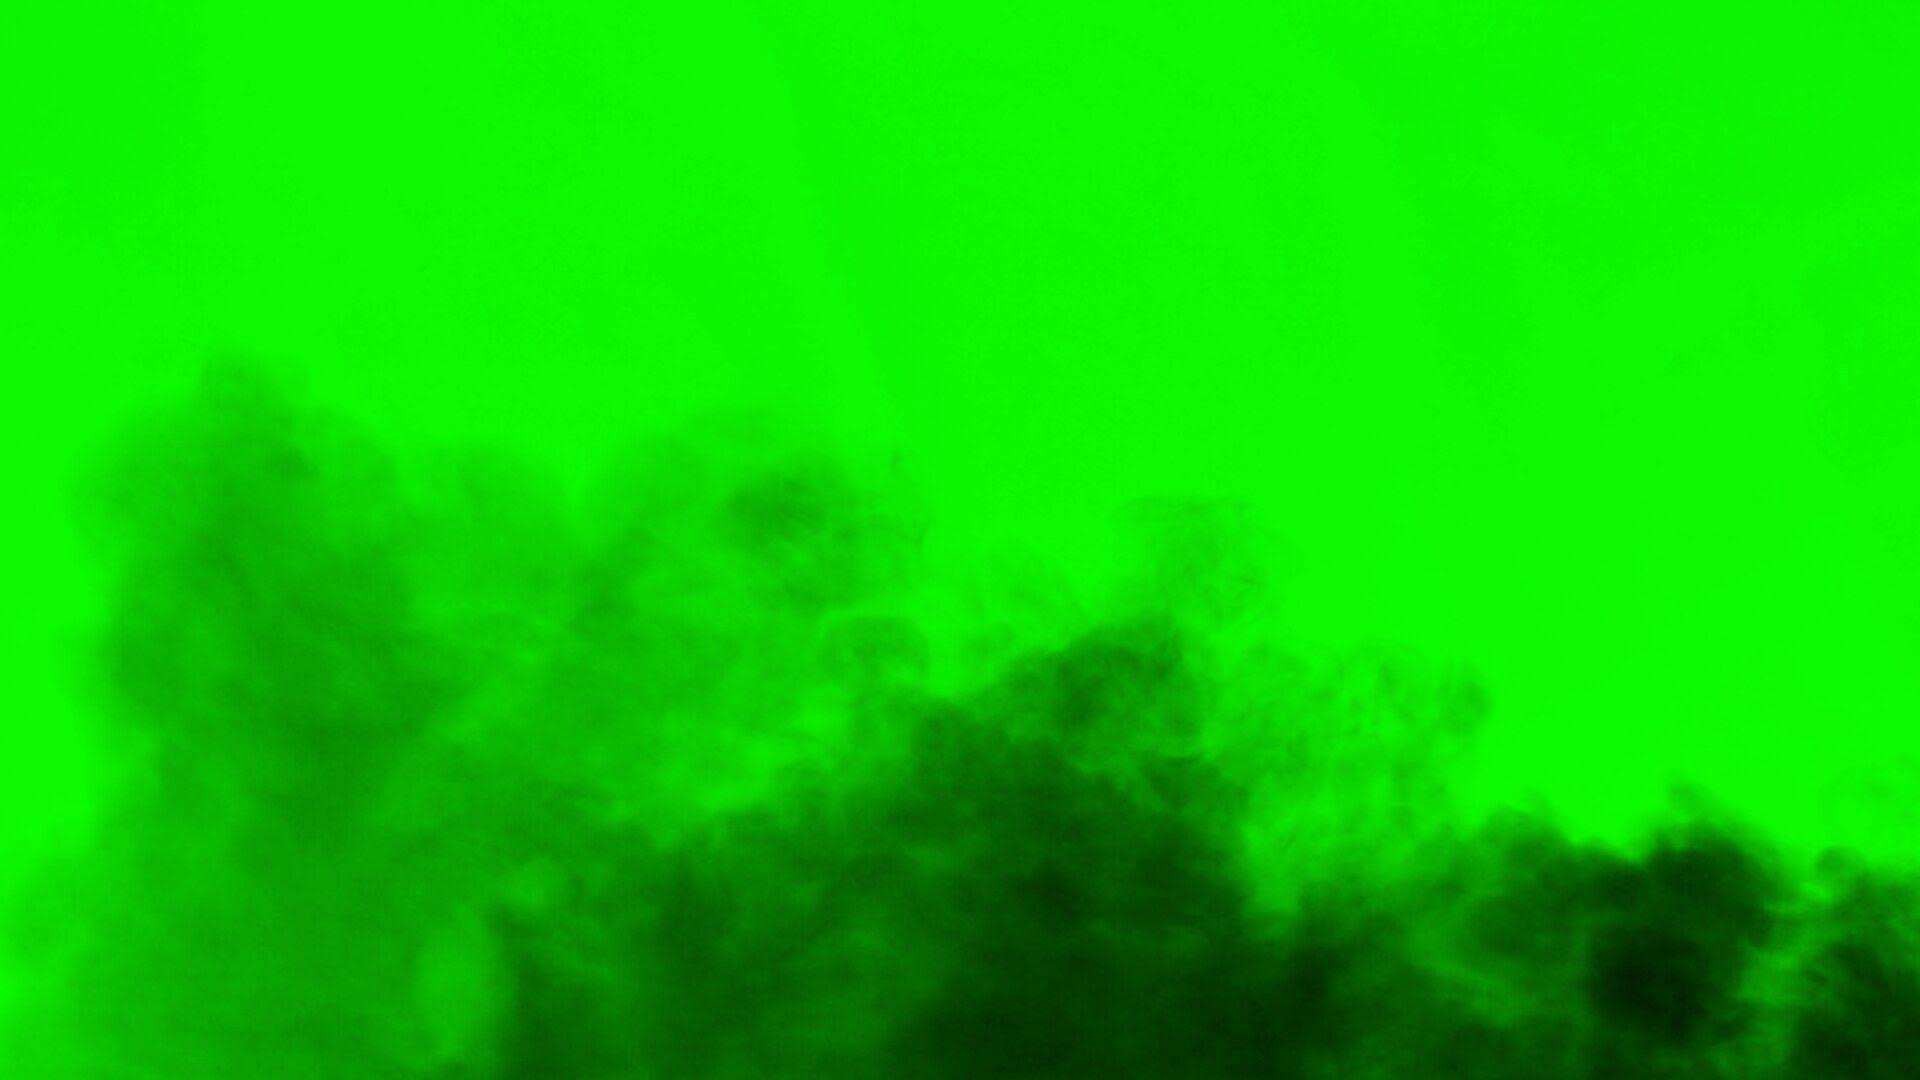 Black Smoke Dust Wave C Green Screen Greenscreen Green Background Video Green Screen Photo